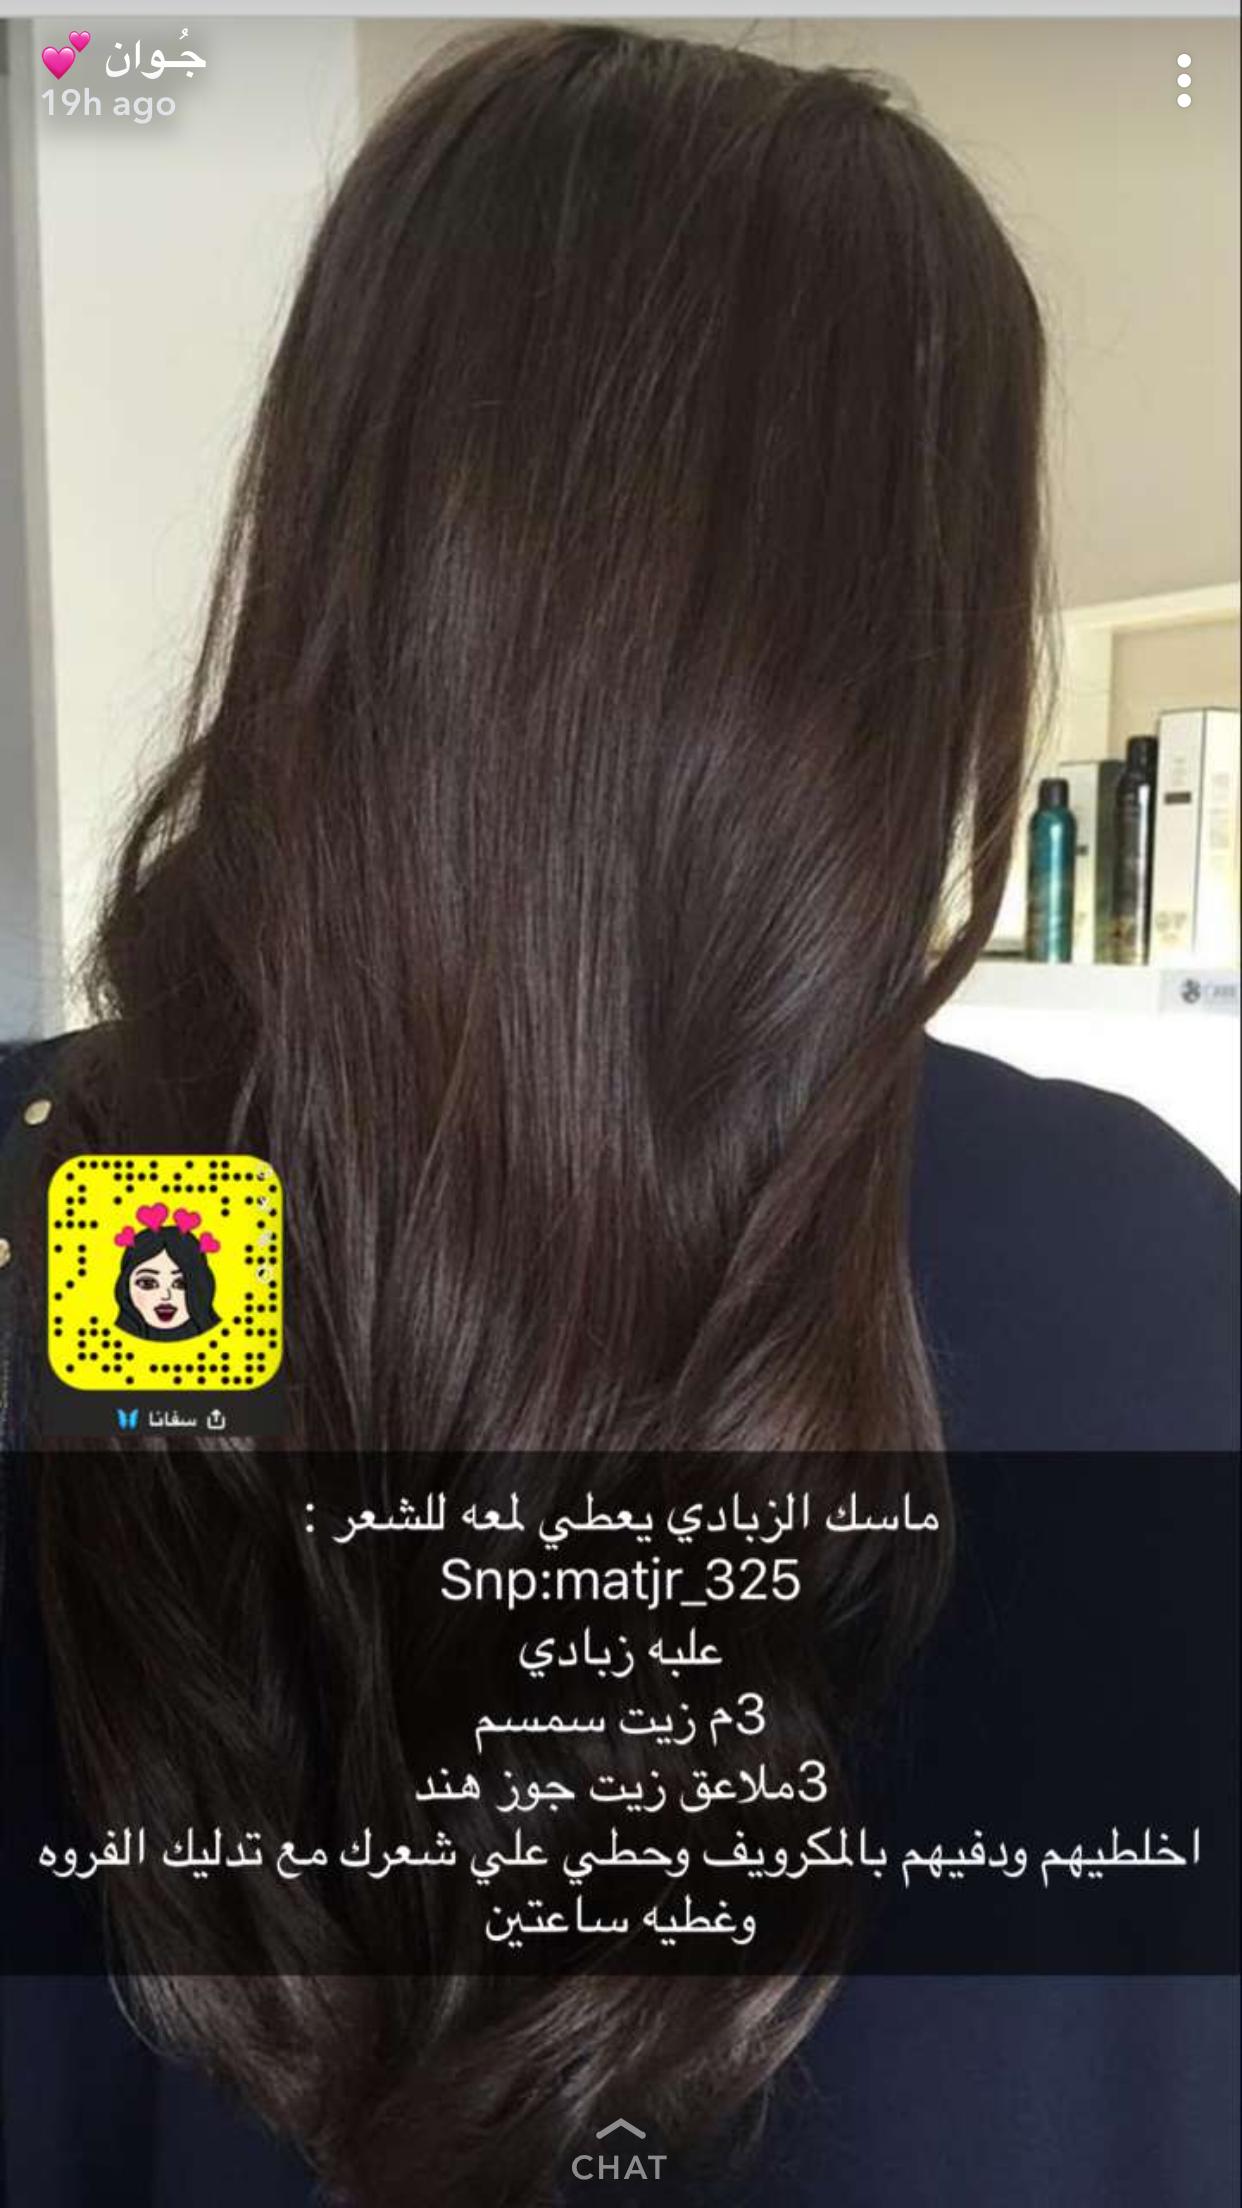 Pin By Maryam Alali On الجمال Beauty Recipes Hair Diy Hair Treatment Healty Hair